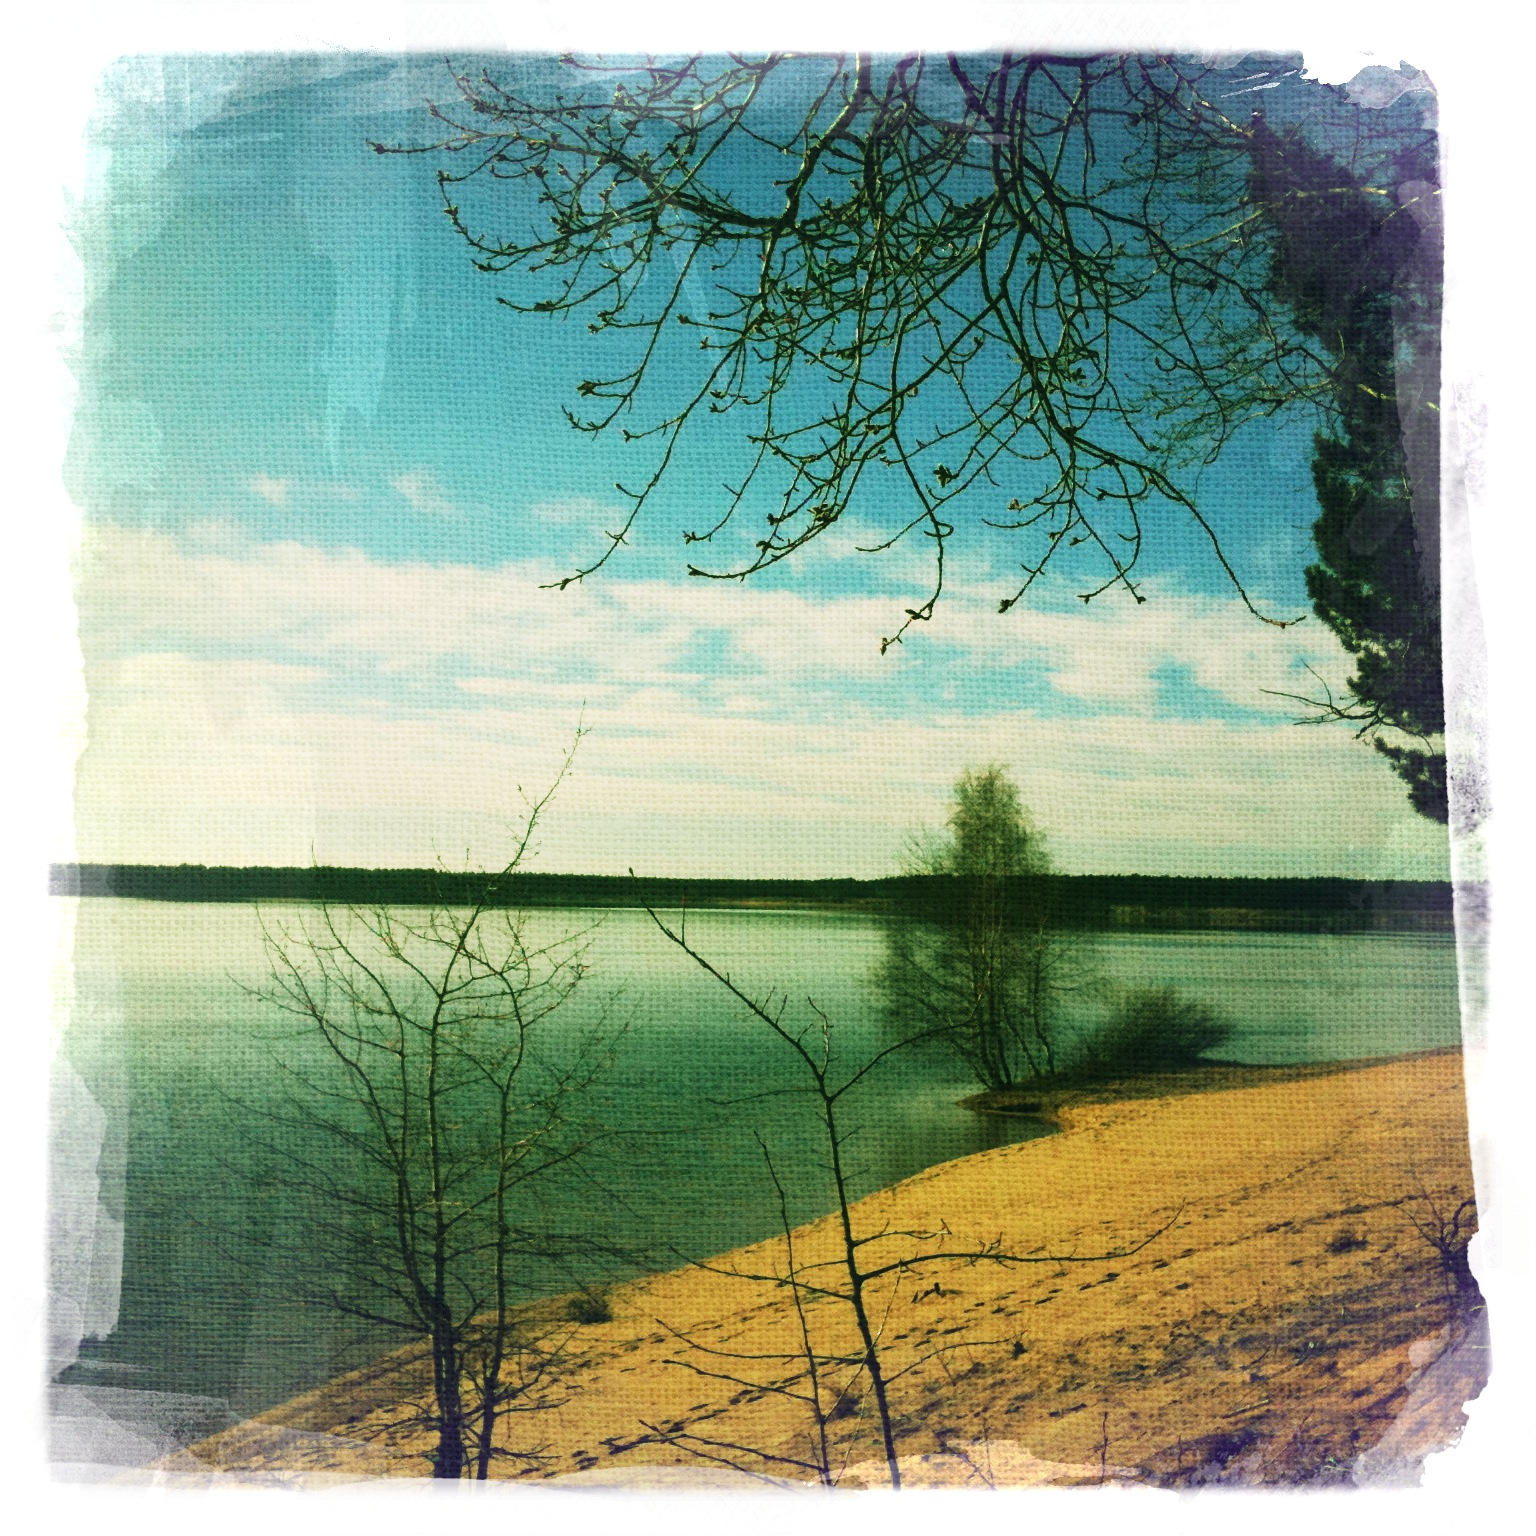 Helenesee